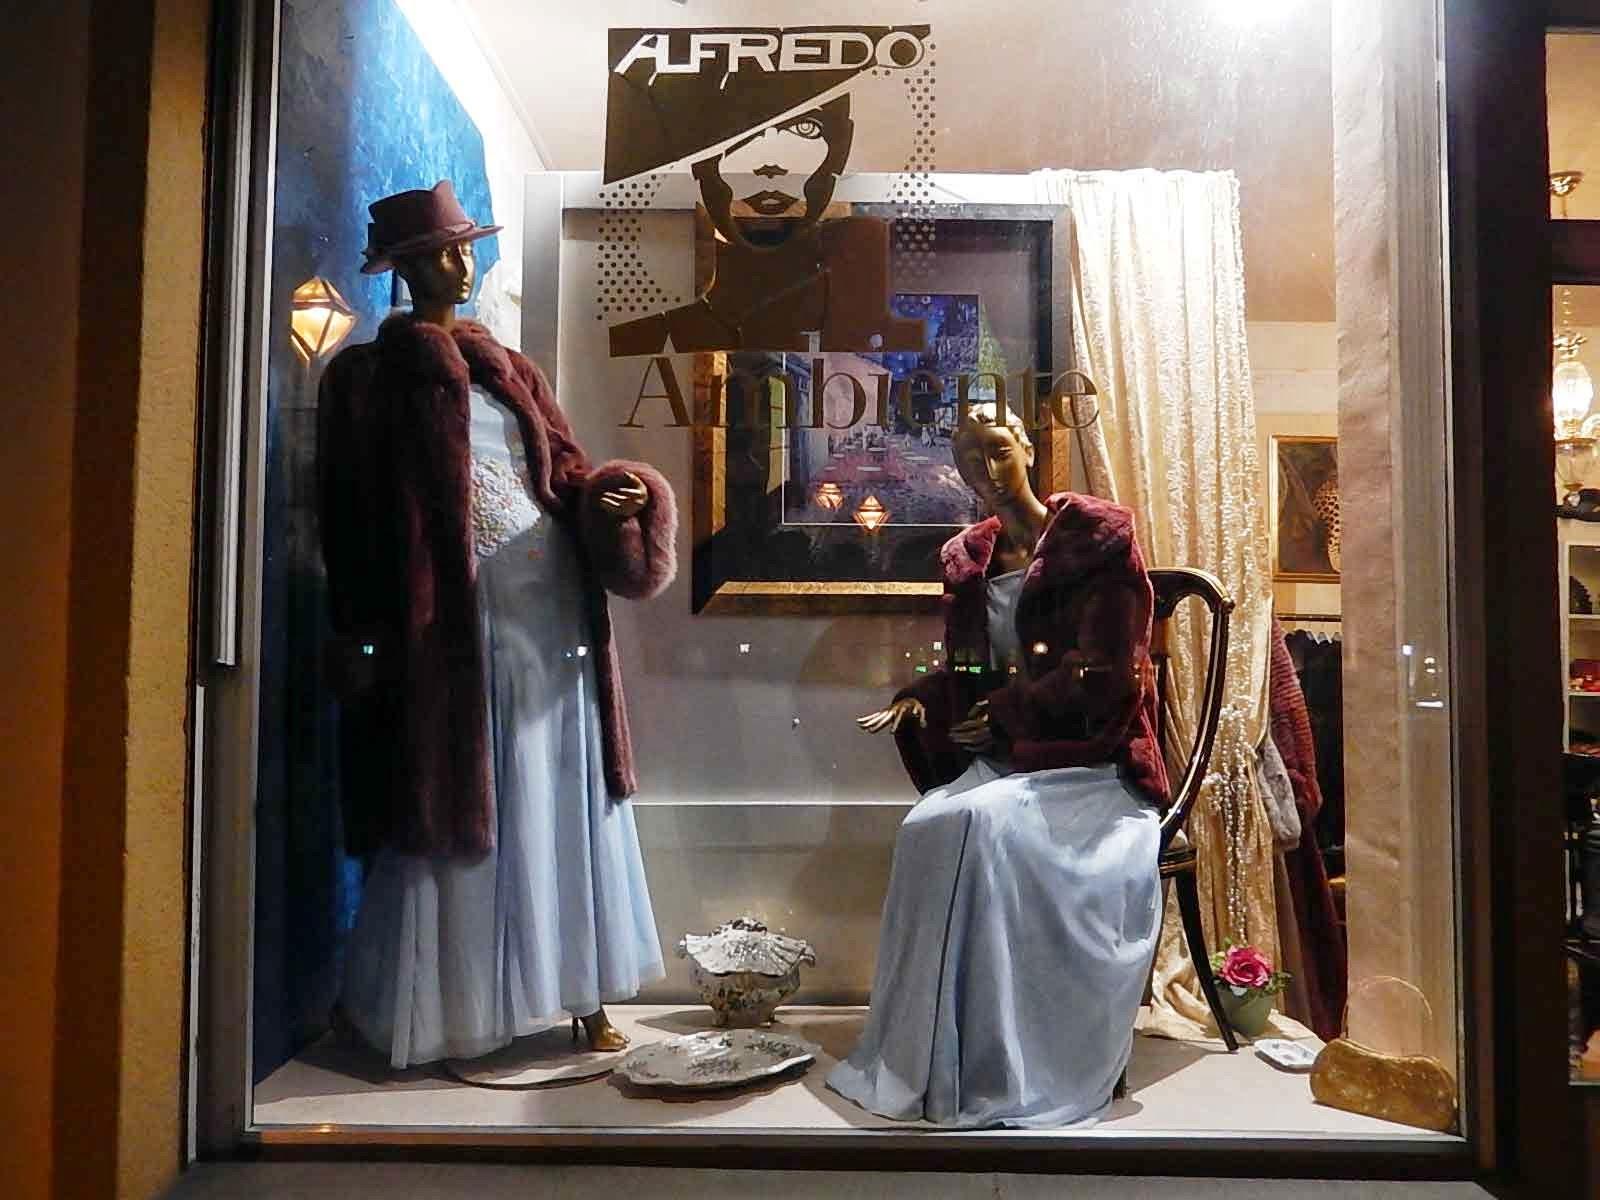 http://www.hse24.de/Thema/Markenwelt/AlfredoPauly/Modedesigner.html